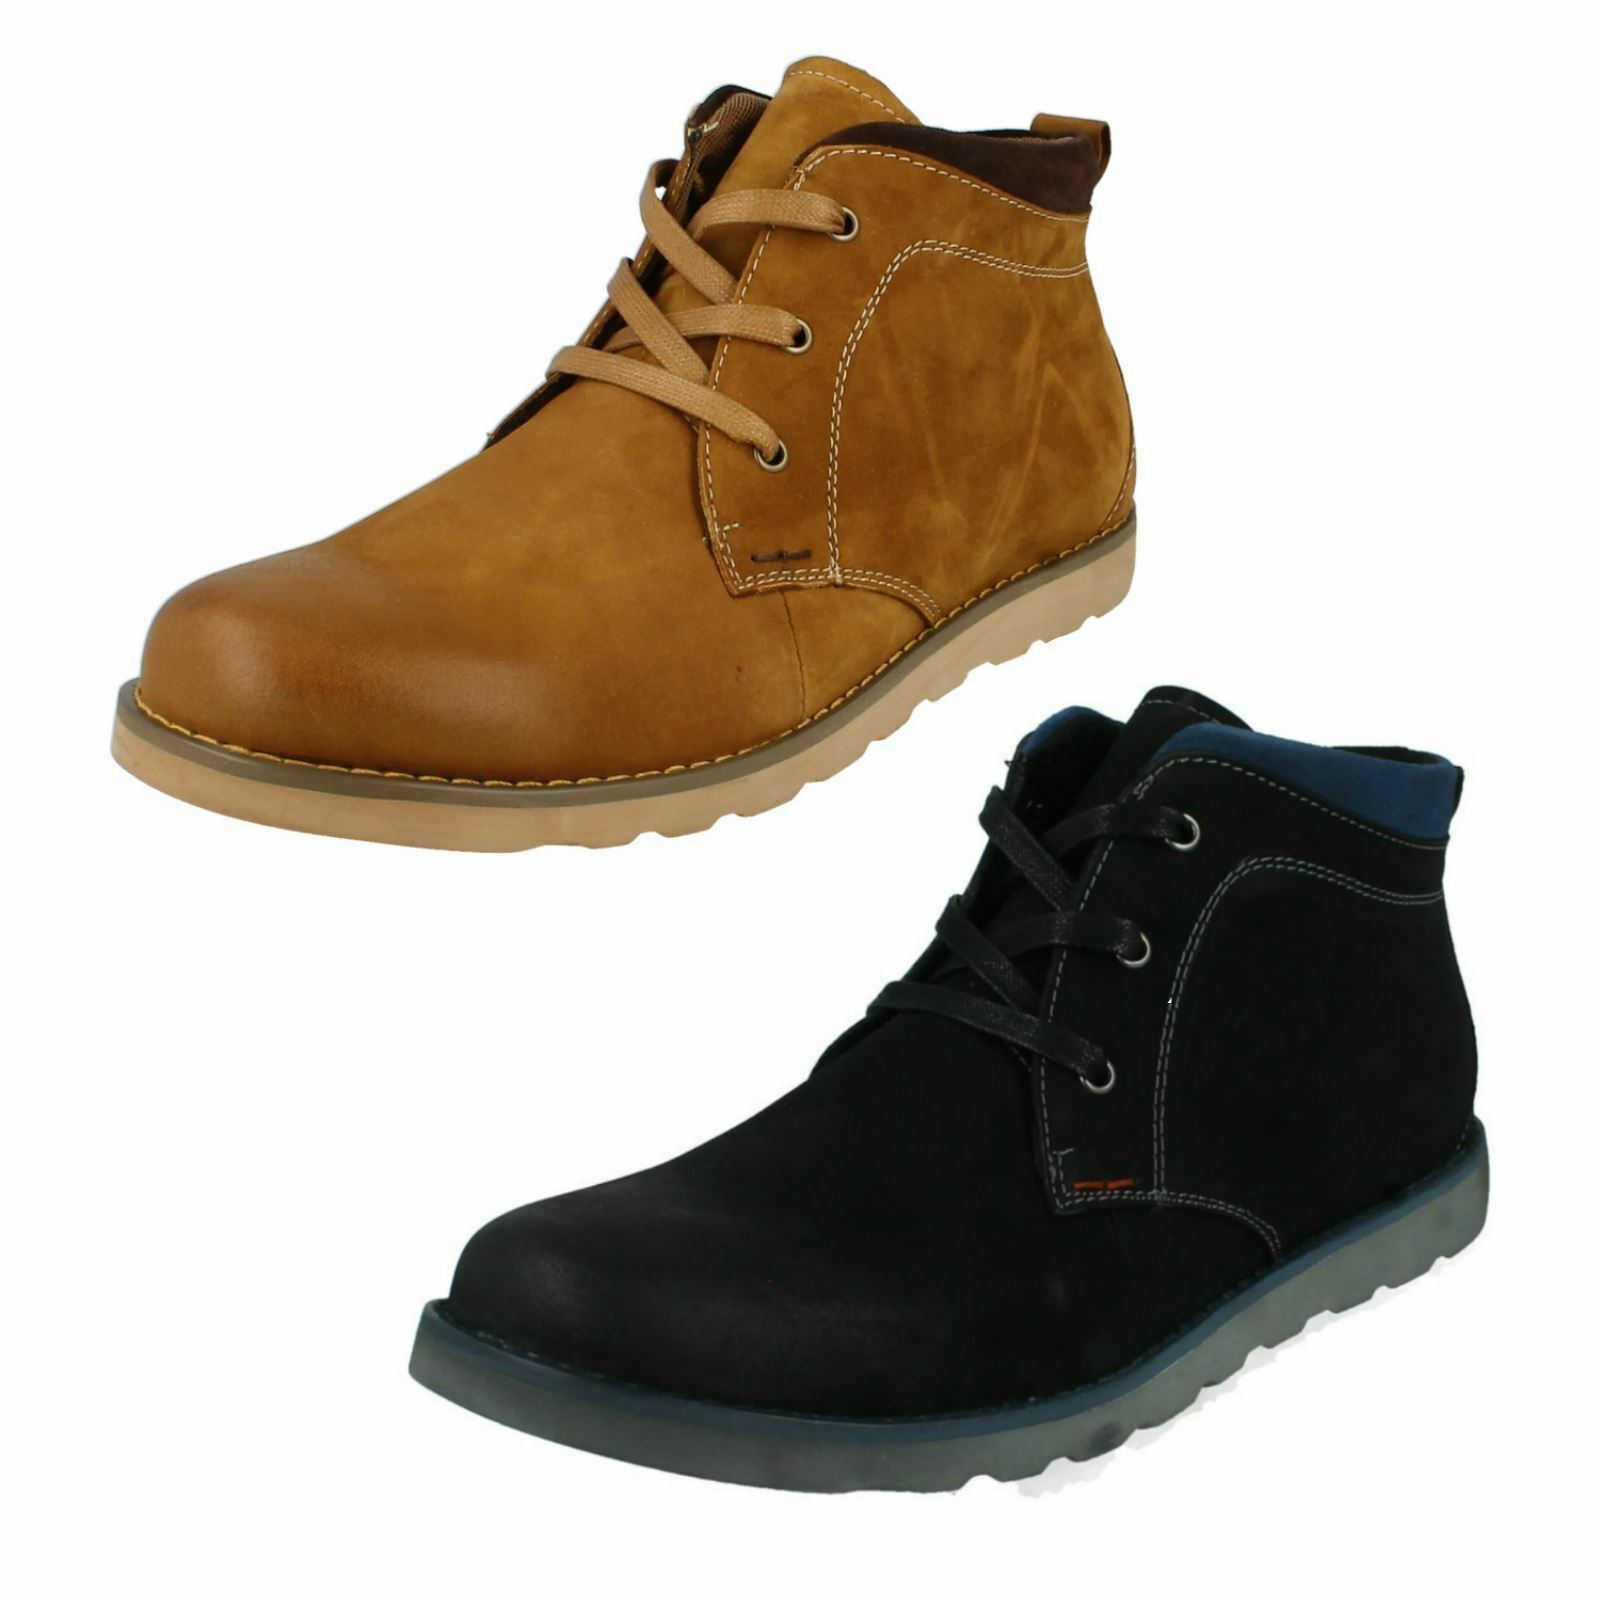 SALE THOMAS BLUNT FORMAL-MENS BLACK/TAN BOOTS-A3056 LEATHER BOOTS-A3056 BLACK/TAN 8d6fb6